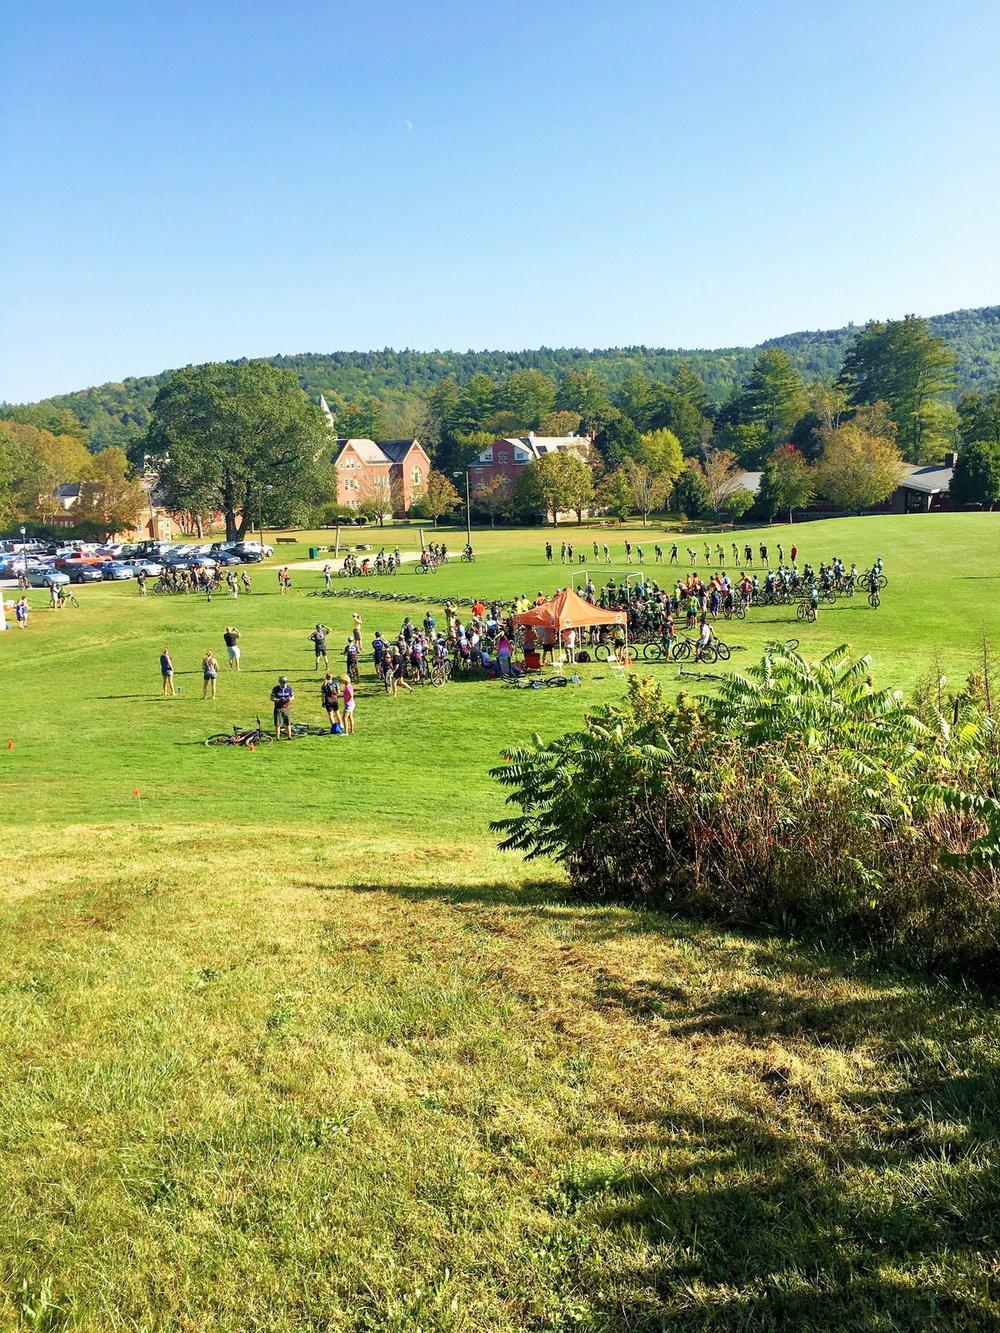 Mountain Biking at Vermont Academy - September 27, 2017  - 7926.JPG